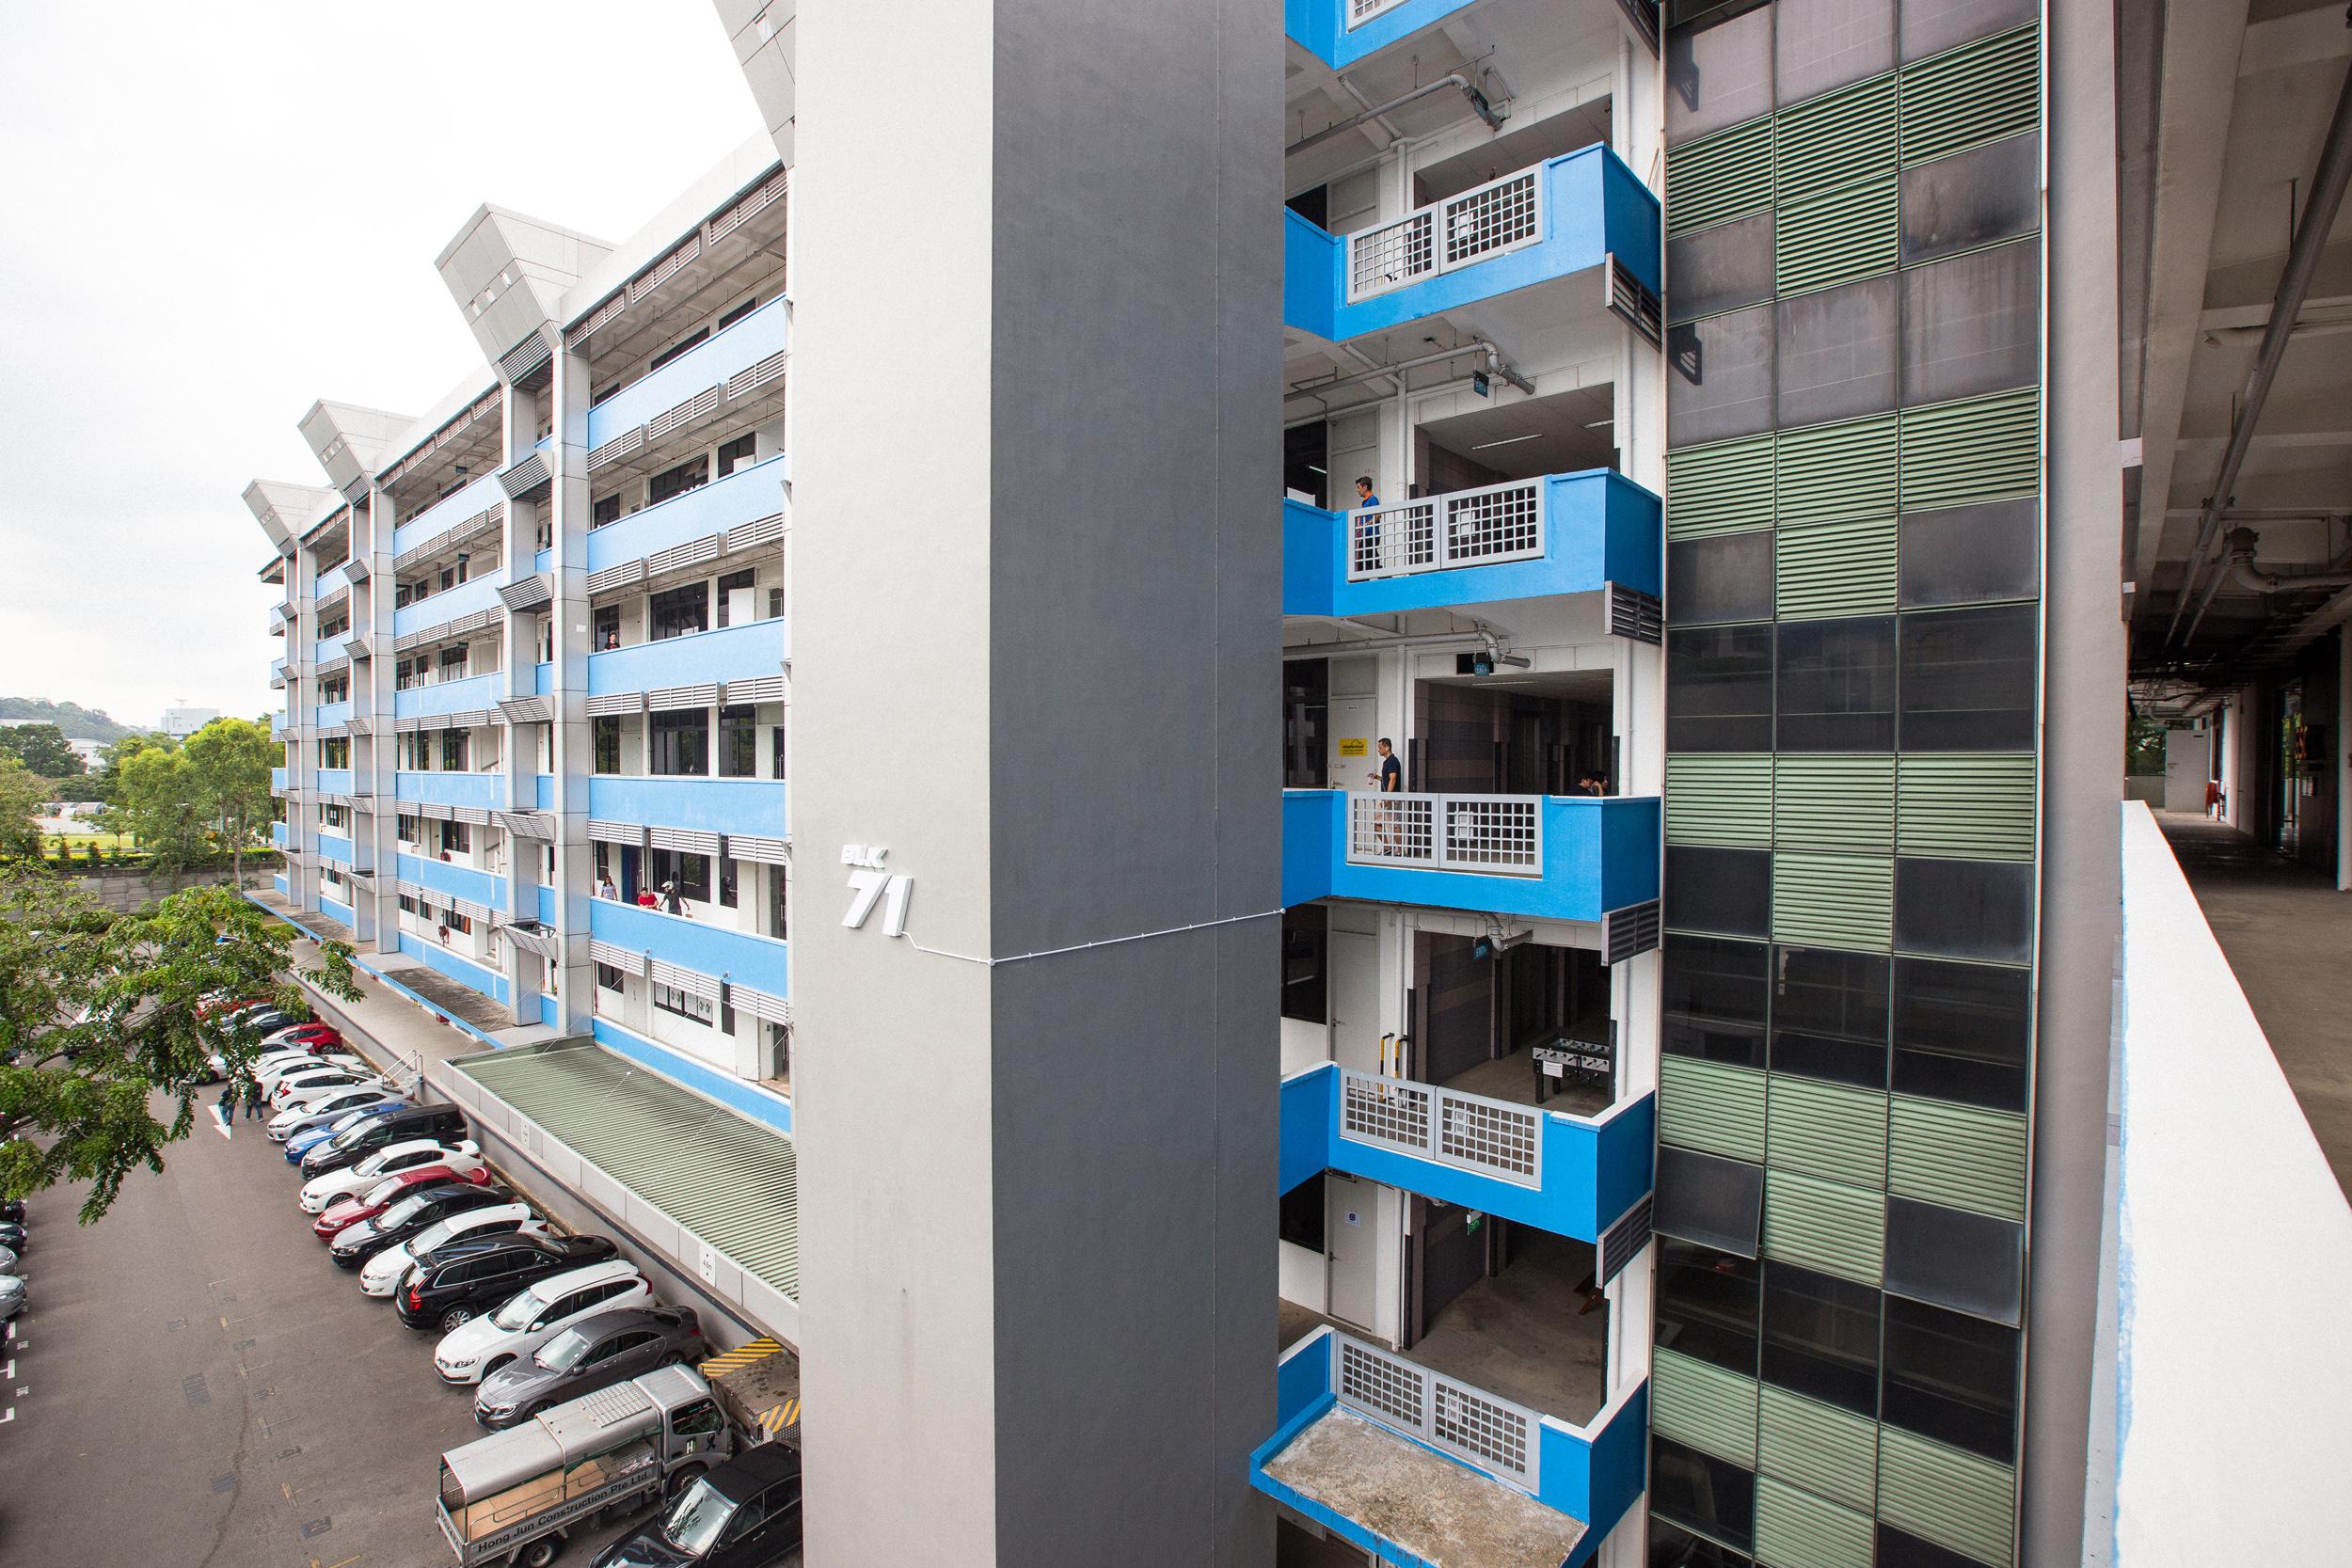 singapore-photographer-zainal-zainal-studio-mci-sme-towkay-24.jpg